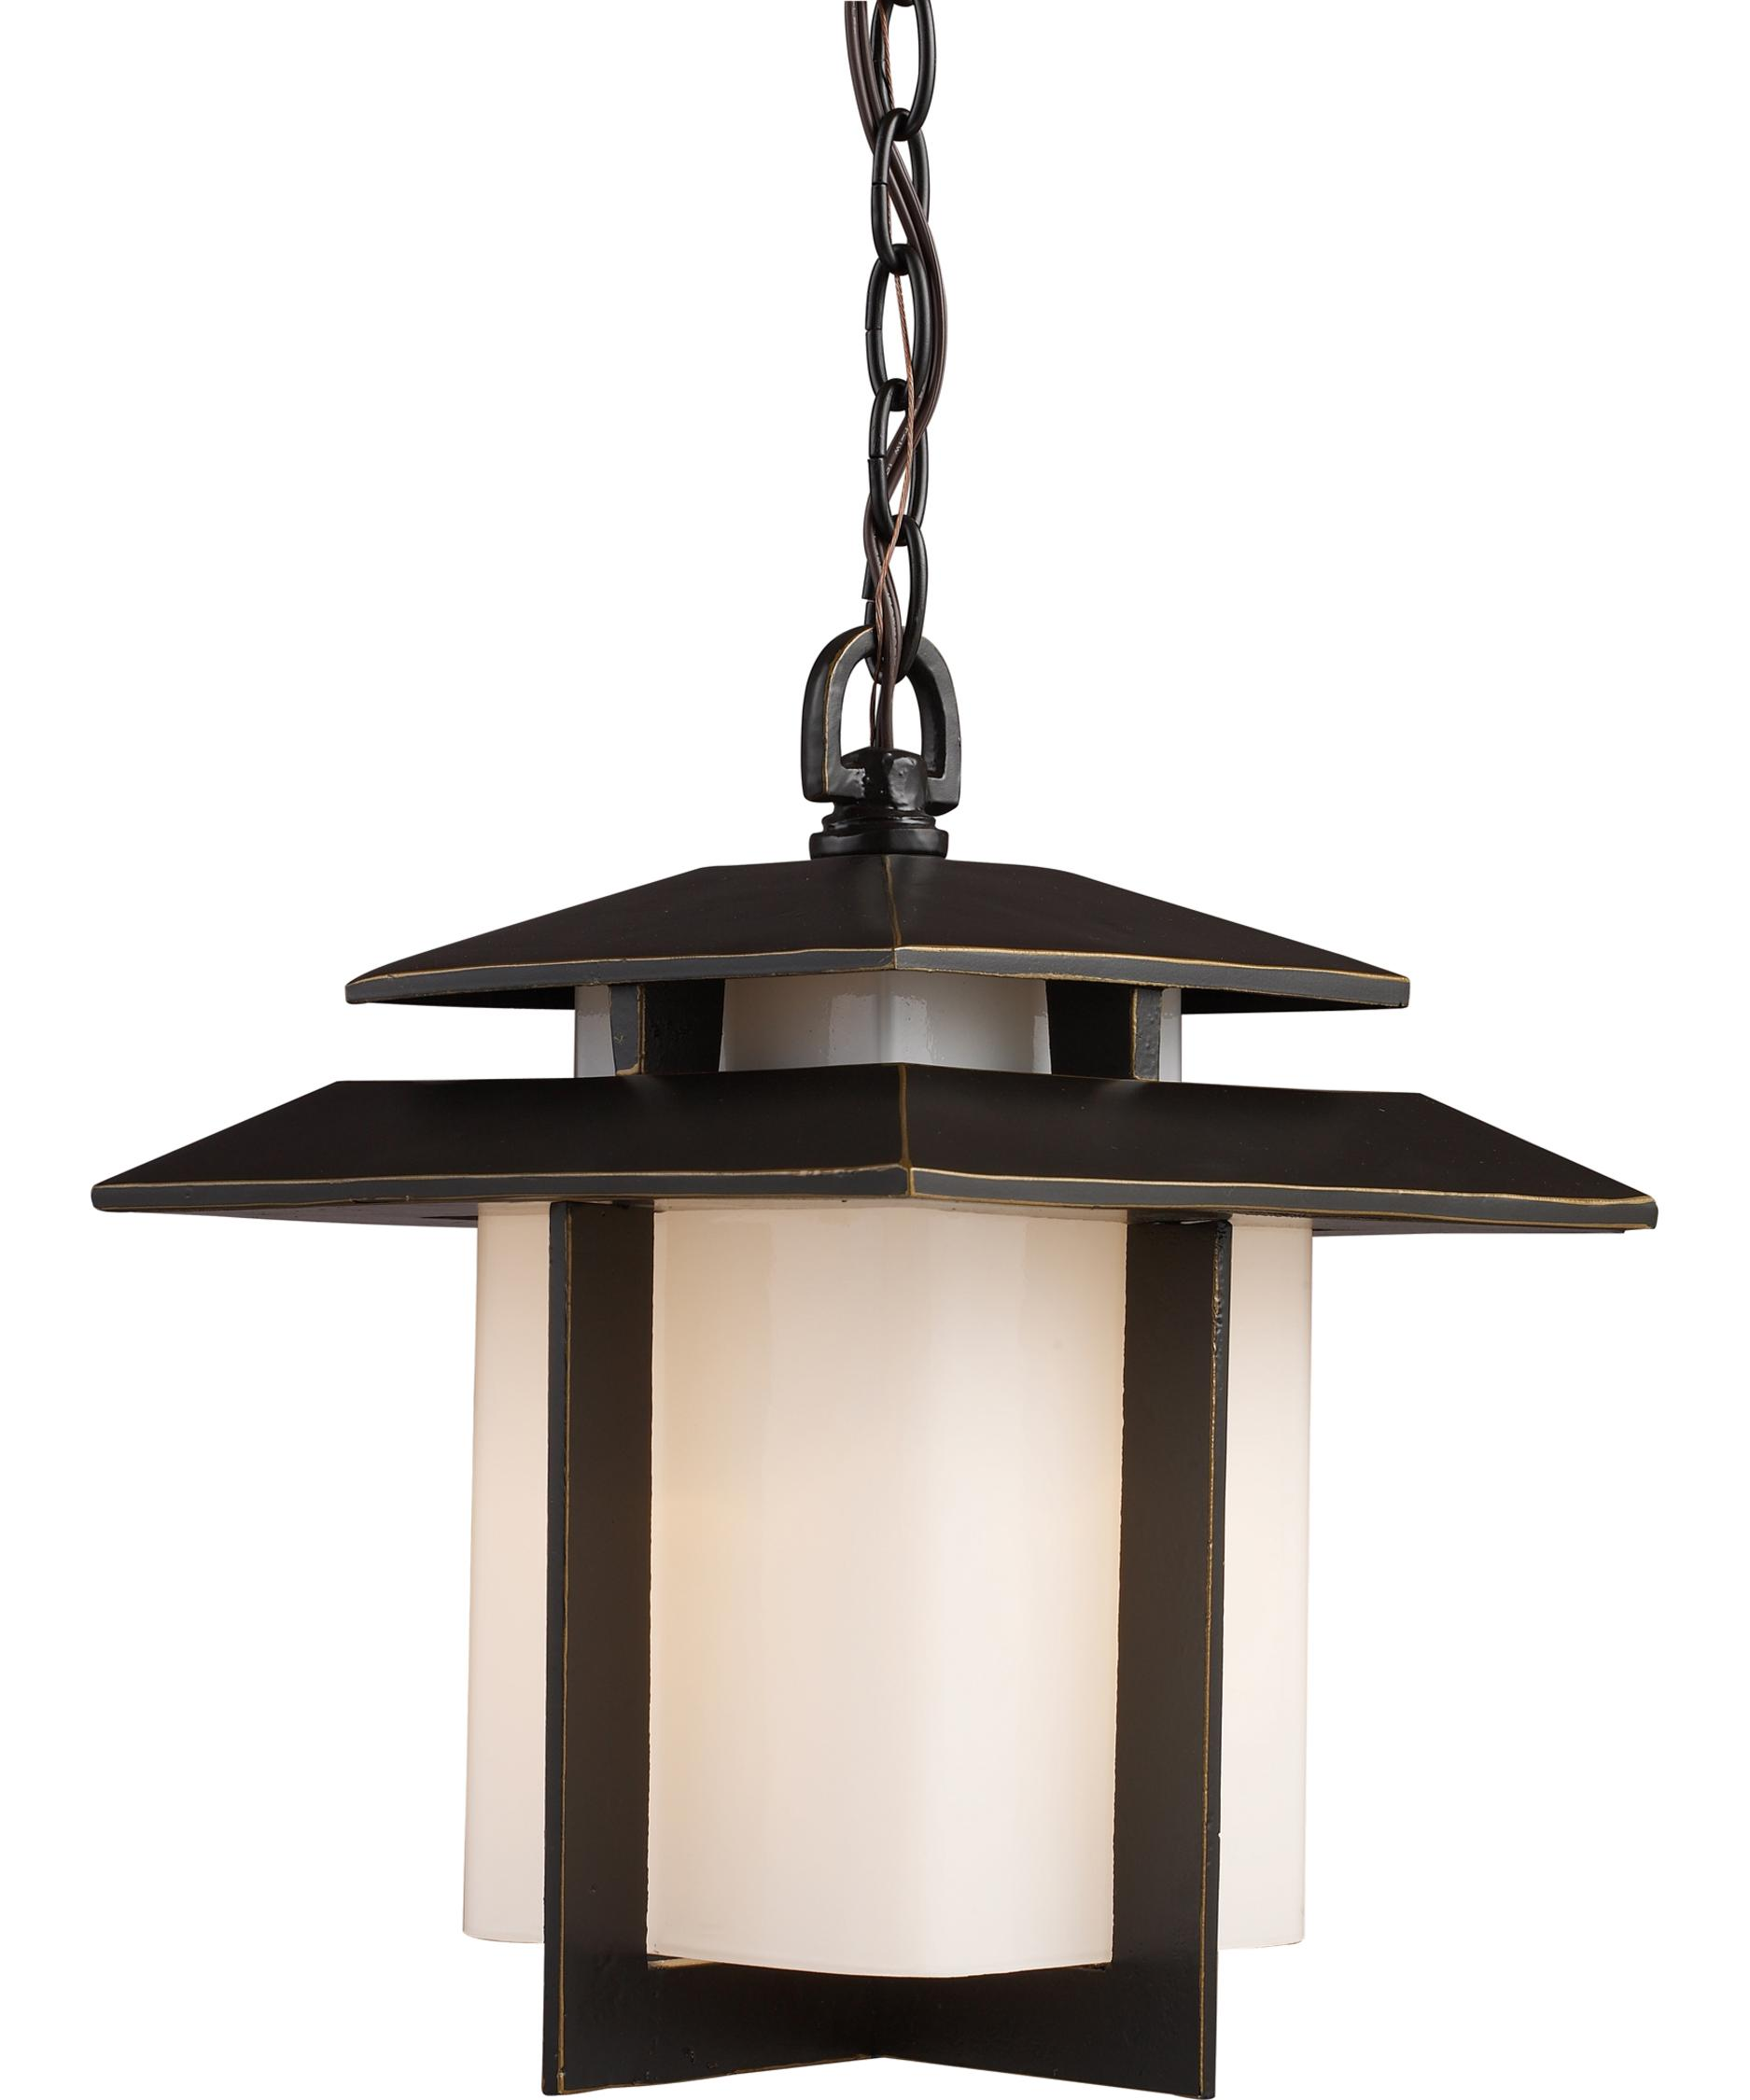 Outdoor hanging lamp - Elk Lighting 42172 1 Kanso 10 Inch Wide 1 Light Outdoor Hanging Lantern Capitol Lighting 1 800lighting Com